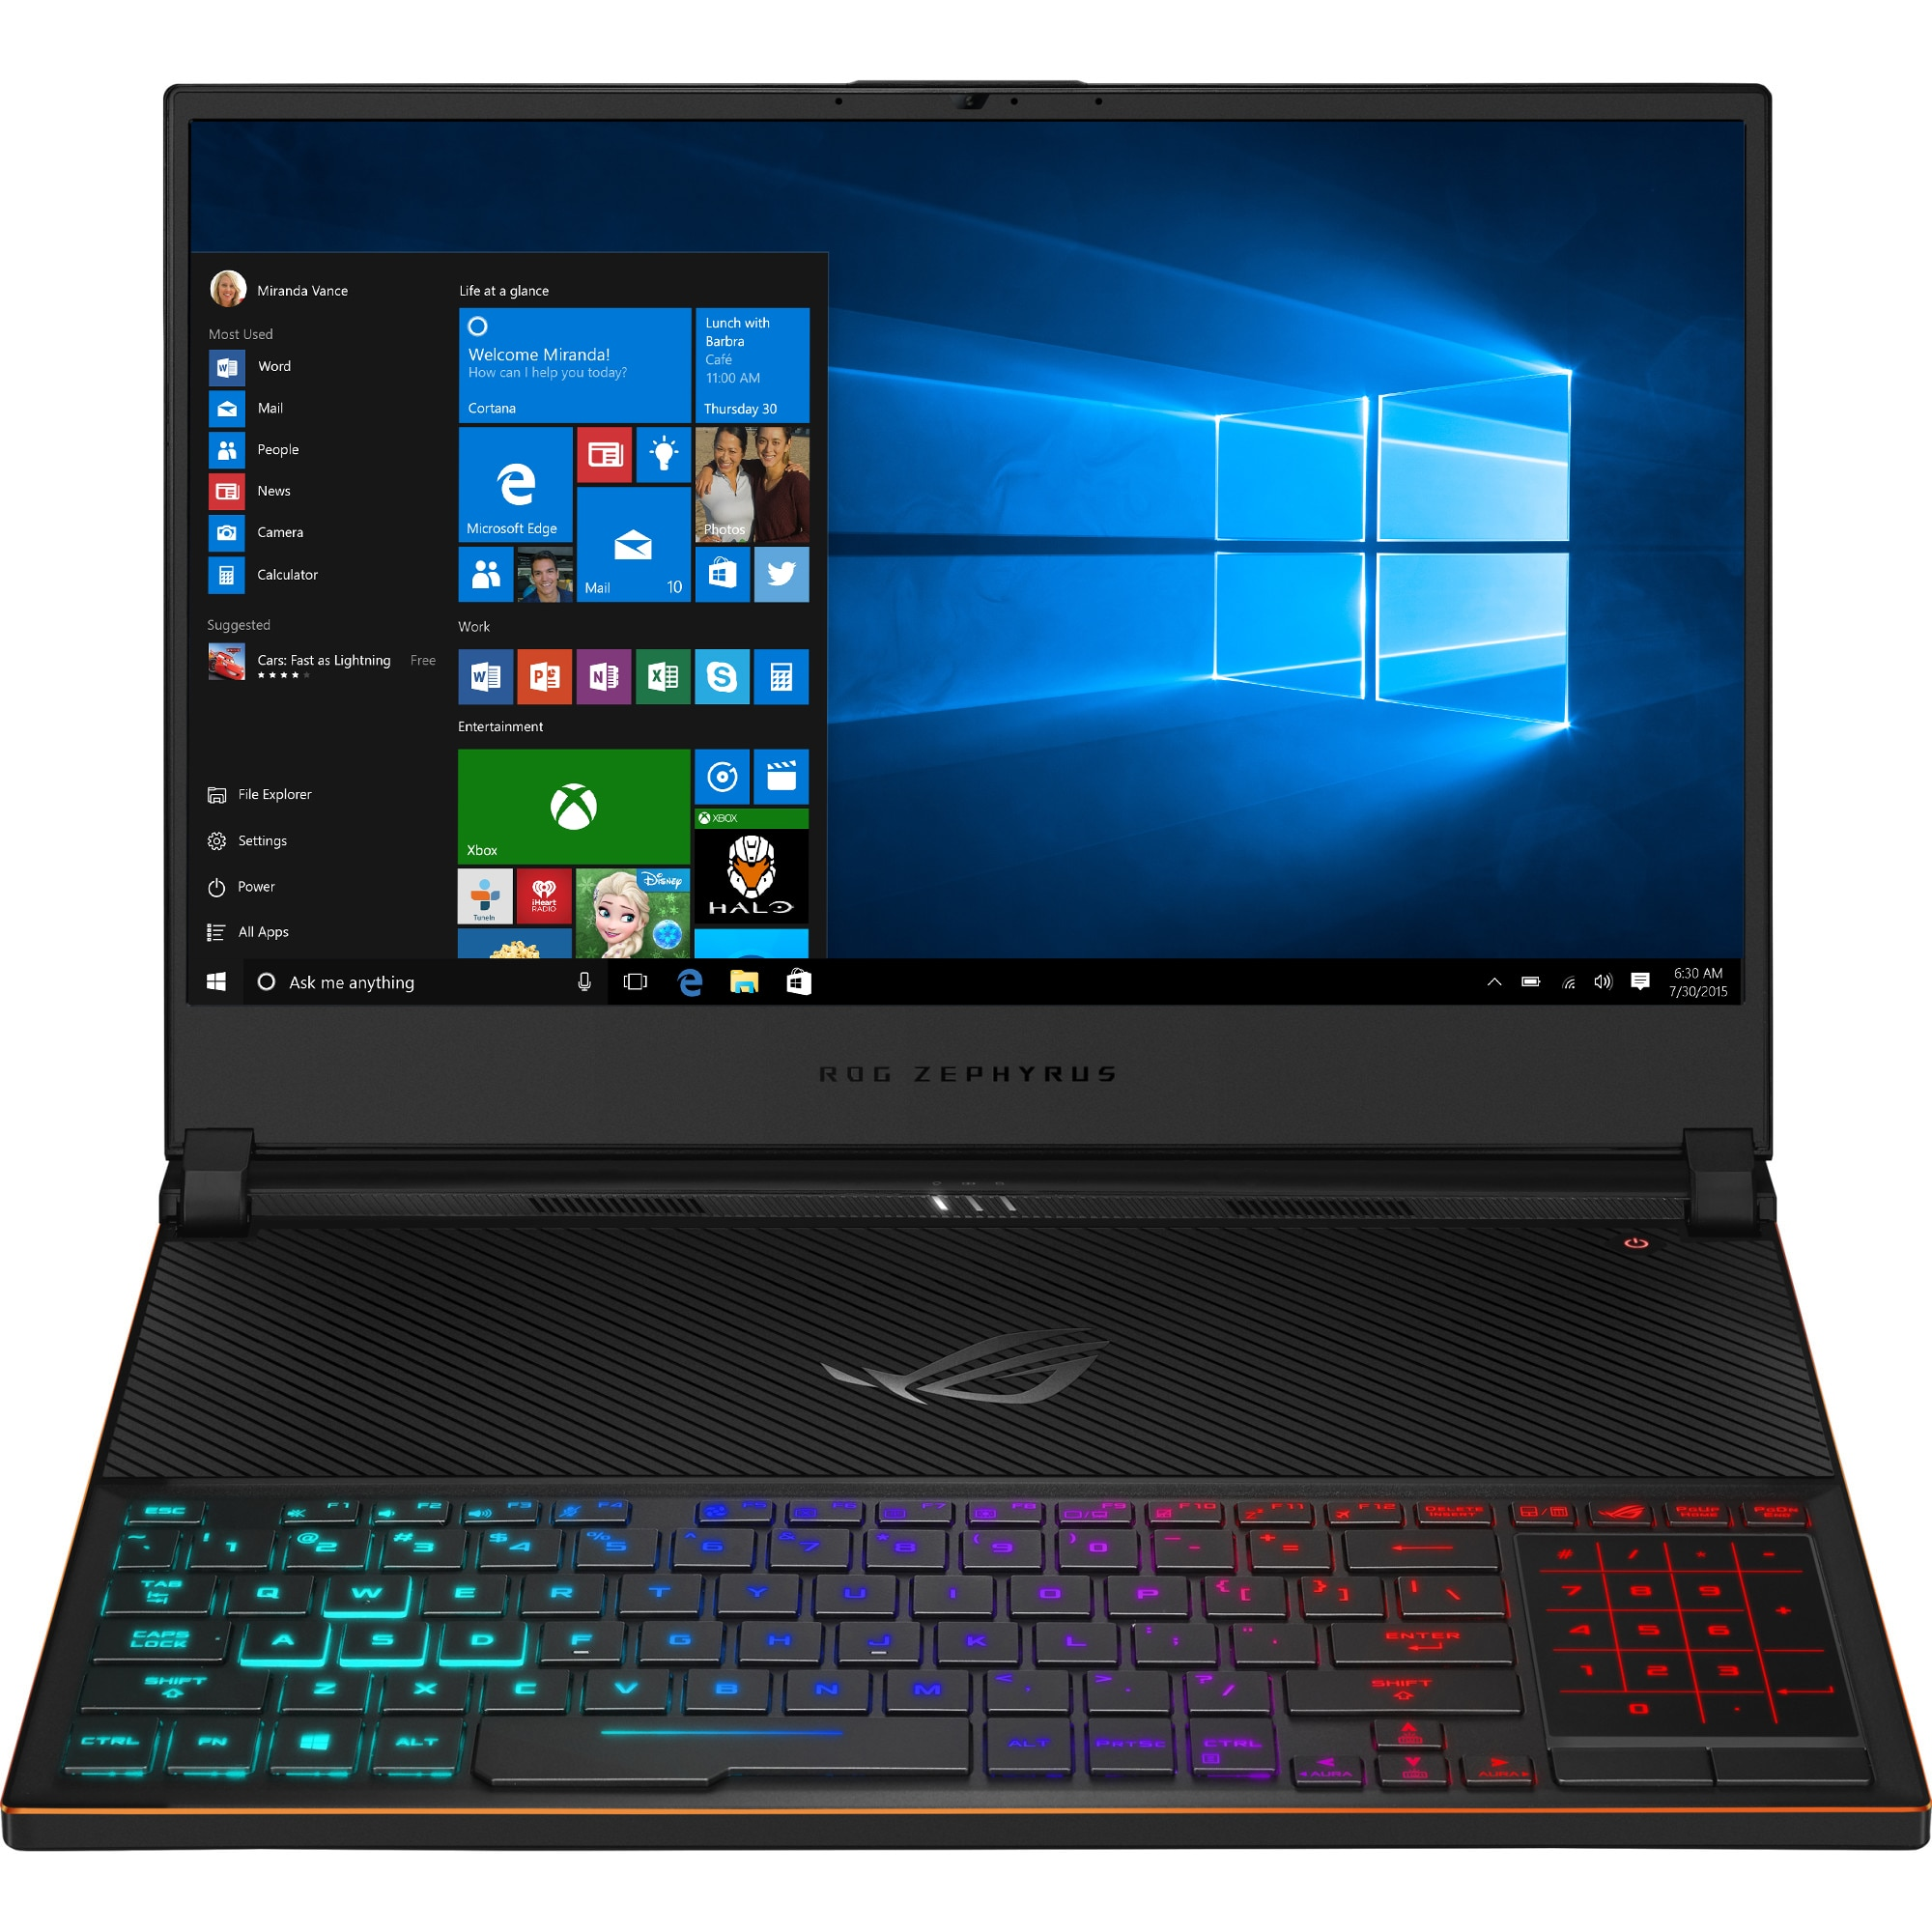 "Fotografie Laptop Gaming ASUS ROG Zephyrus S GX531GX cu procesor Intel® Core™ i7-8750H pana la 4.10 GHz, Coffee Lake, 15.6"", Full HD, IPS, 144Hz, 24GB, 512GB SSD, NVIDIA GeForce RTX 2080 8GB, Microsoft Windows 10, Black"